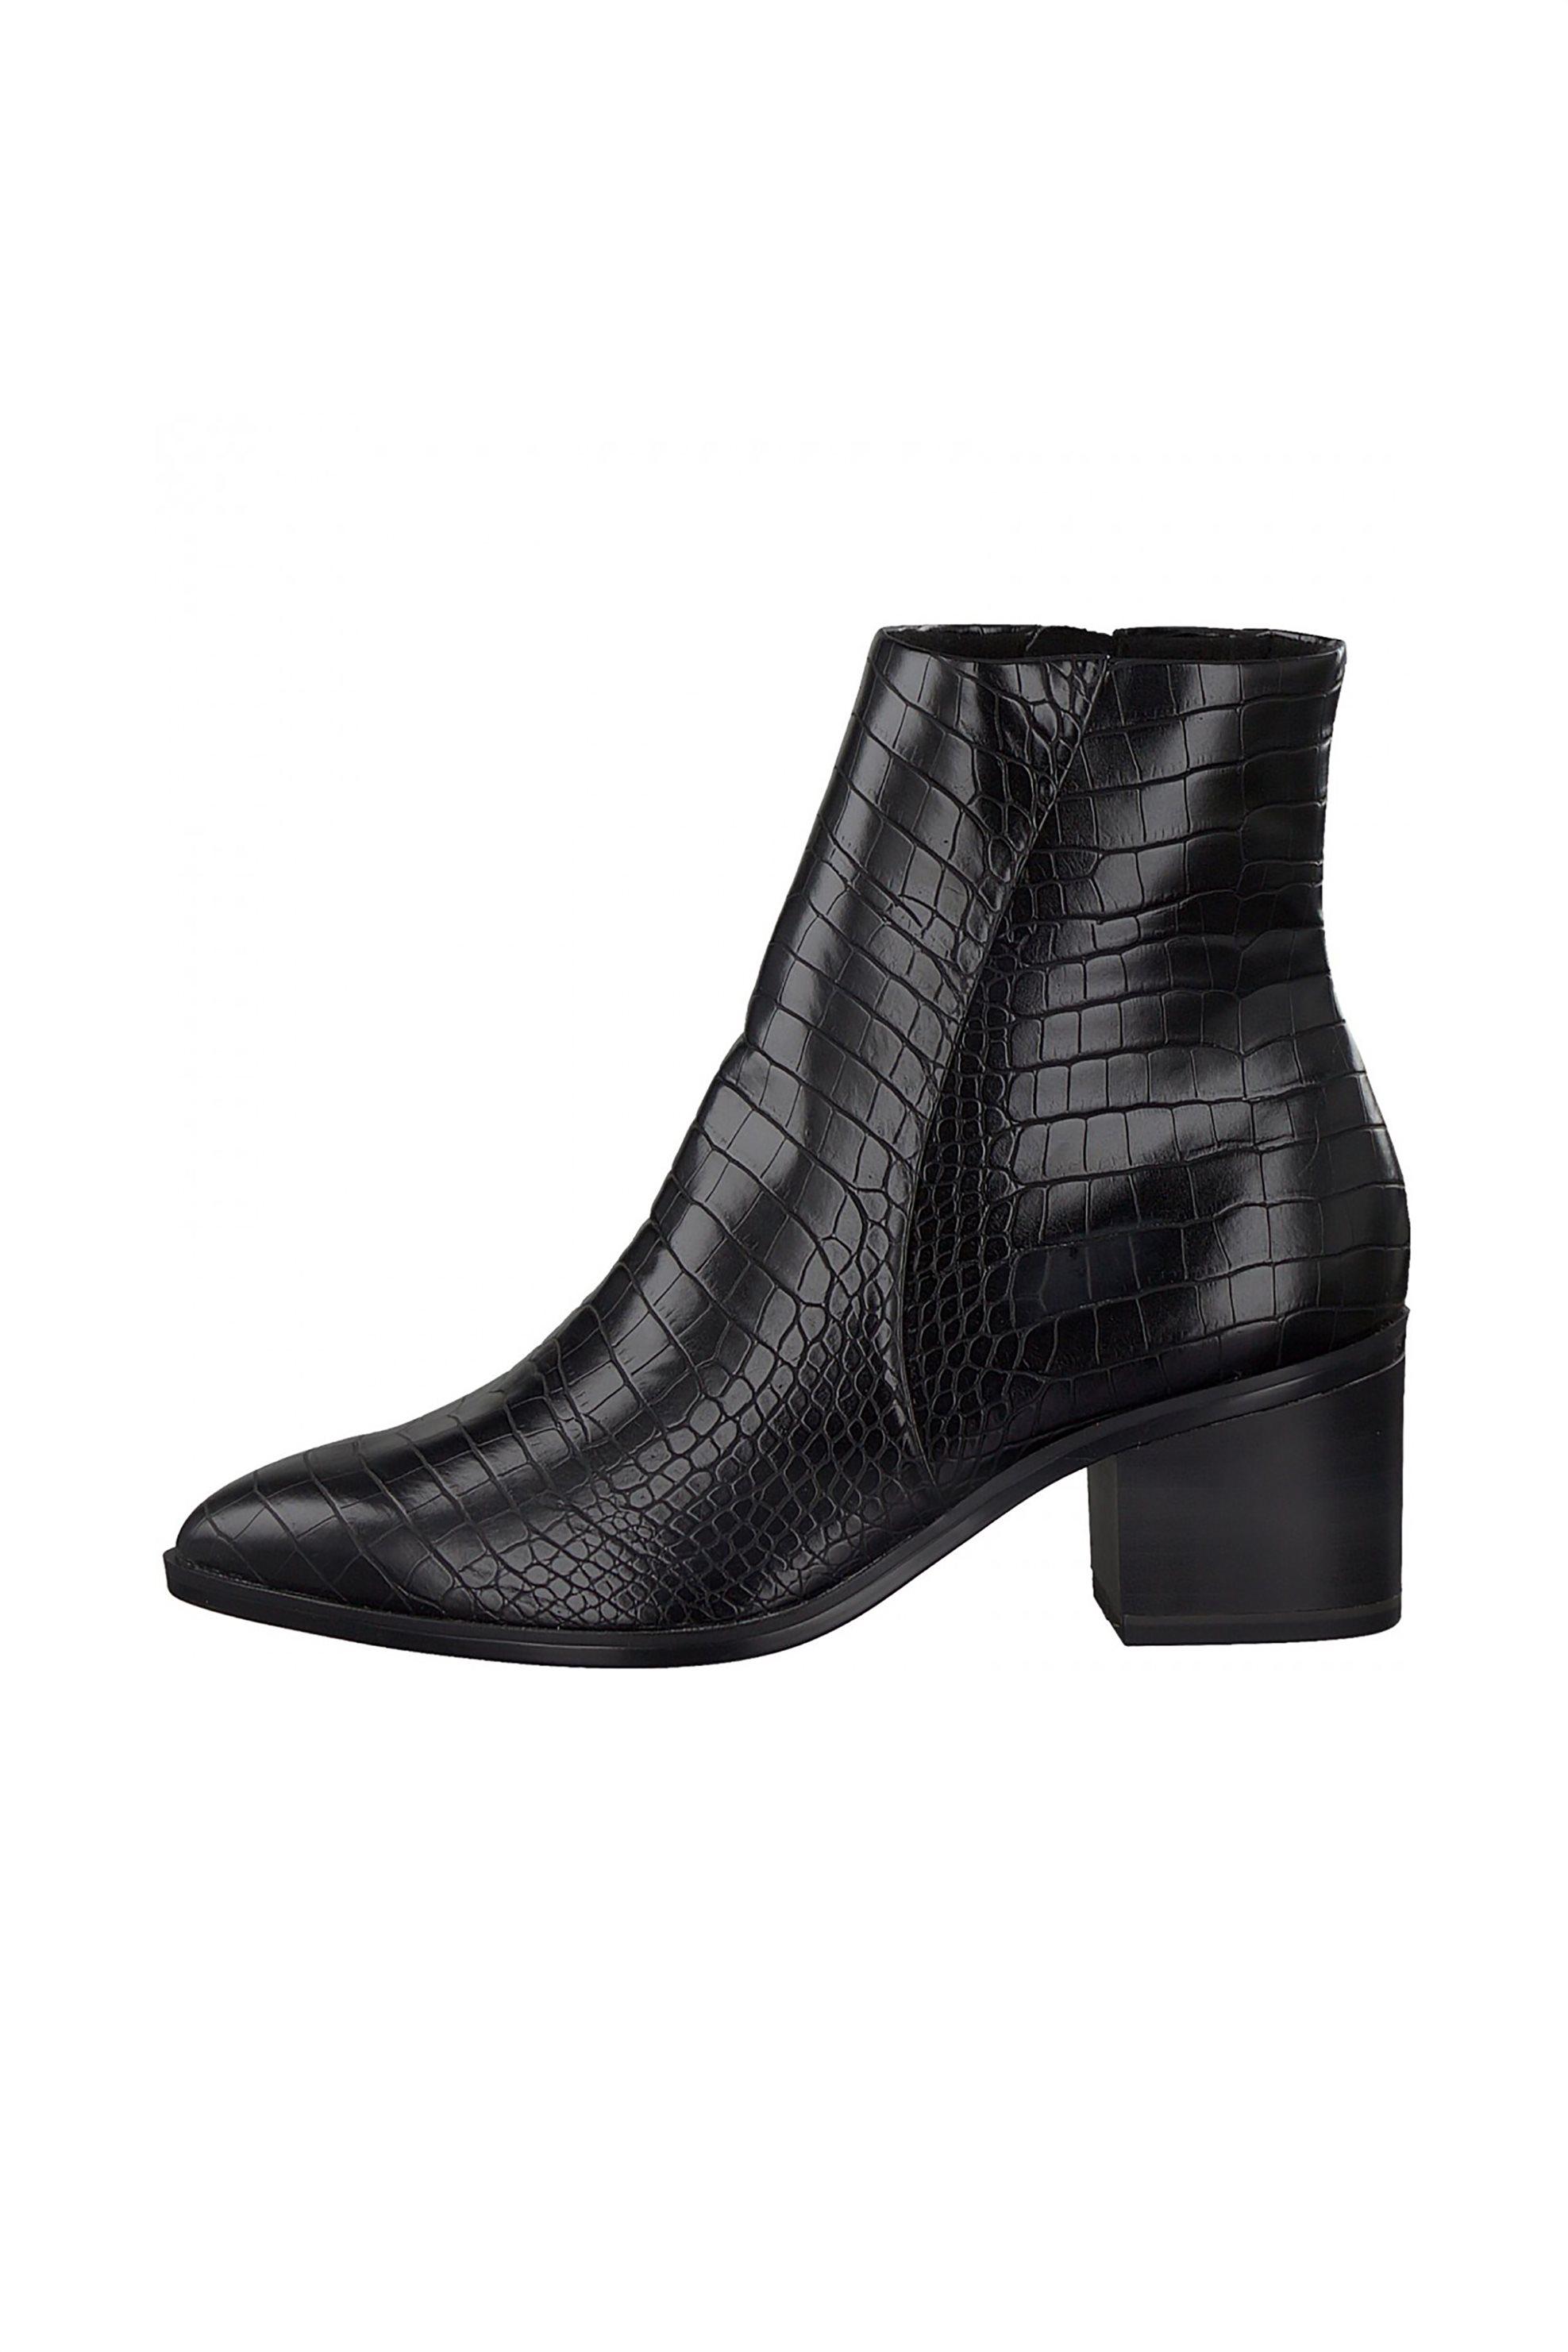 Tamaris γυναικεία croco μποτάκια μονόχρωμα – 1-1-25049-25 – Μαύρο